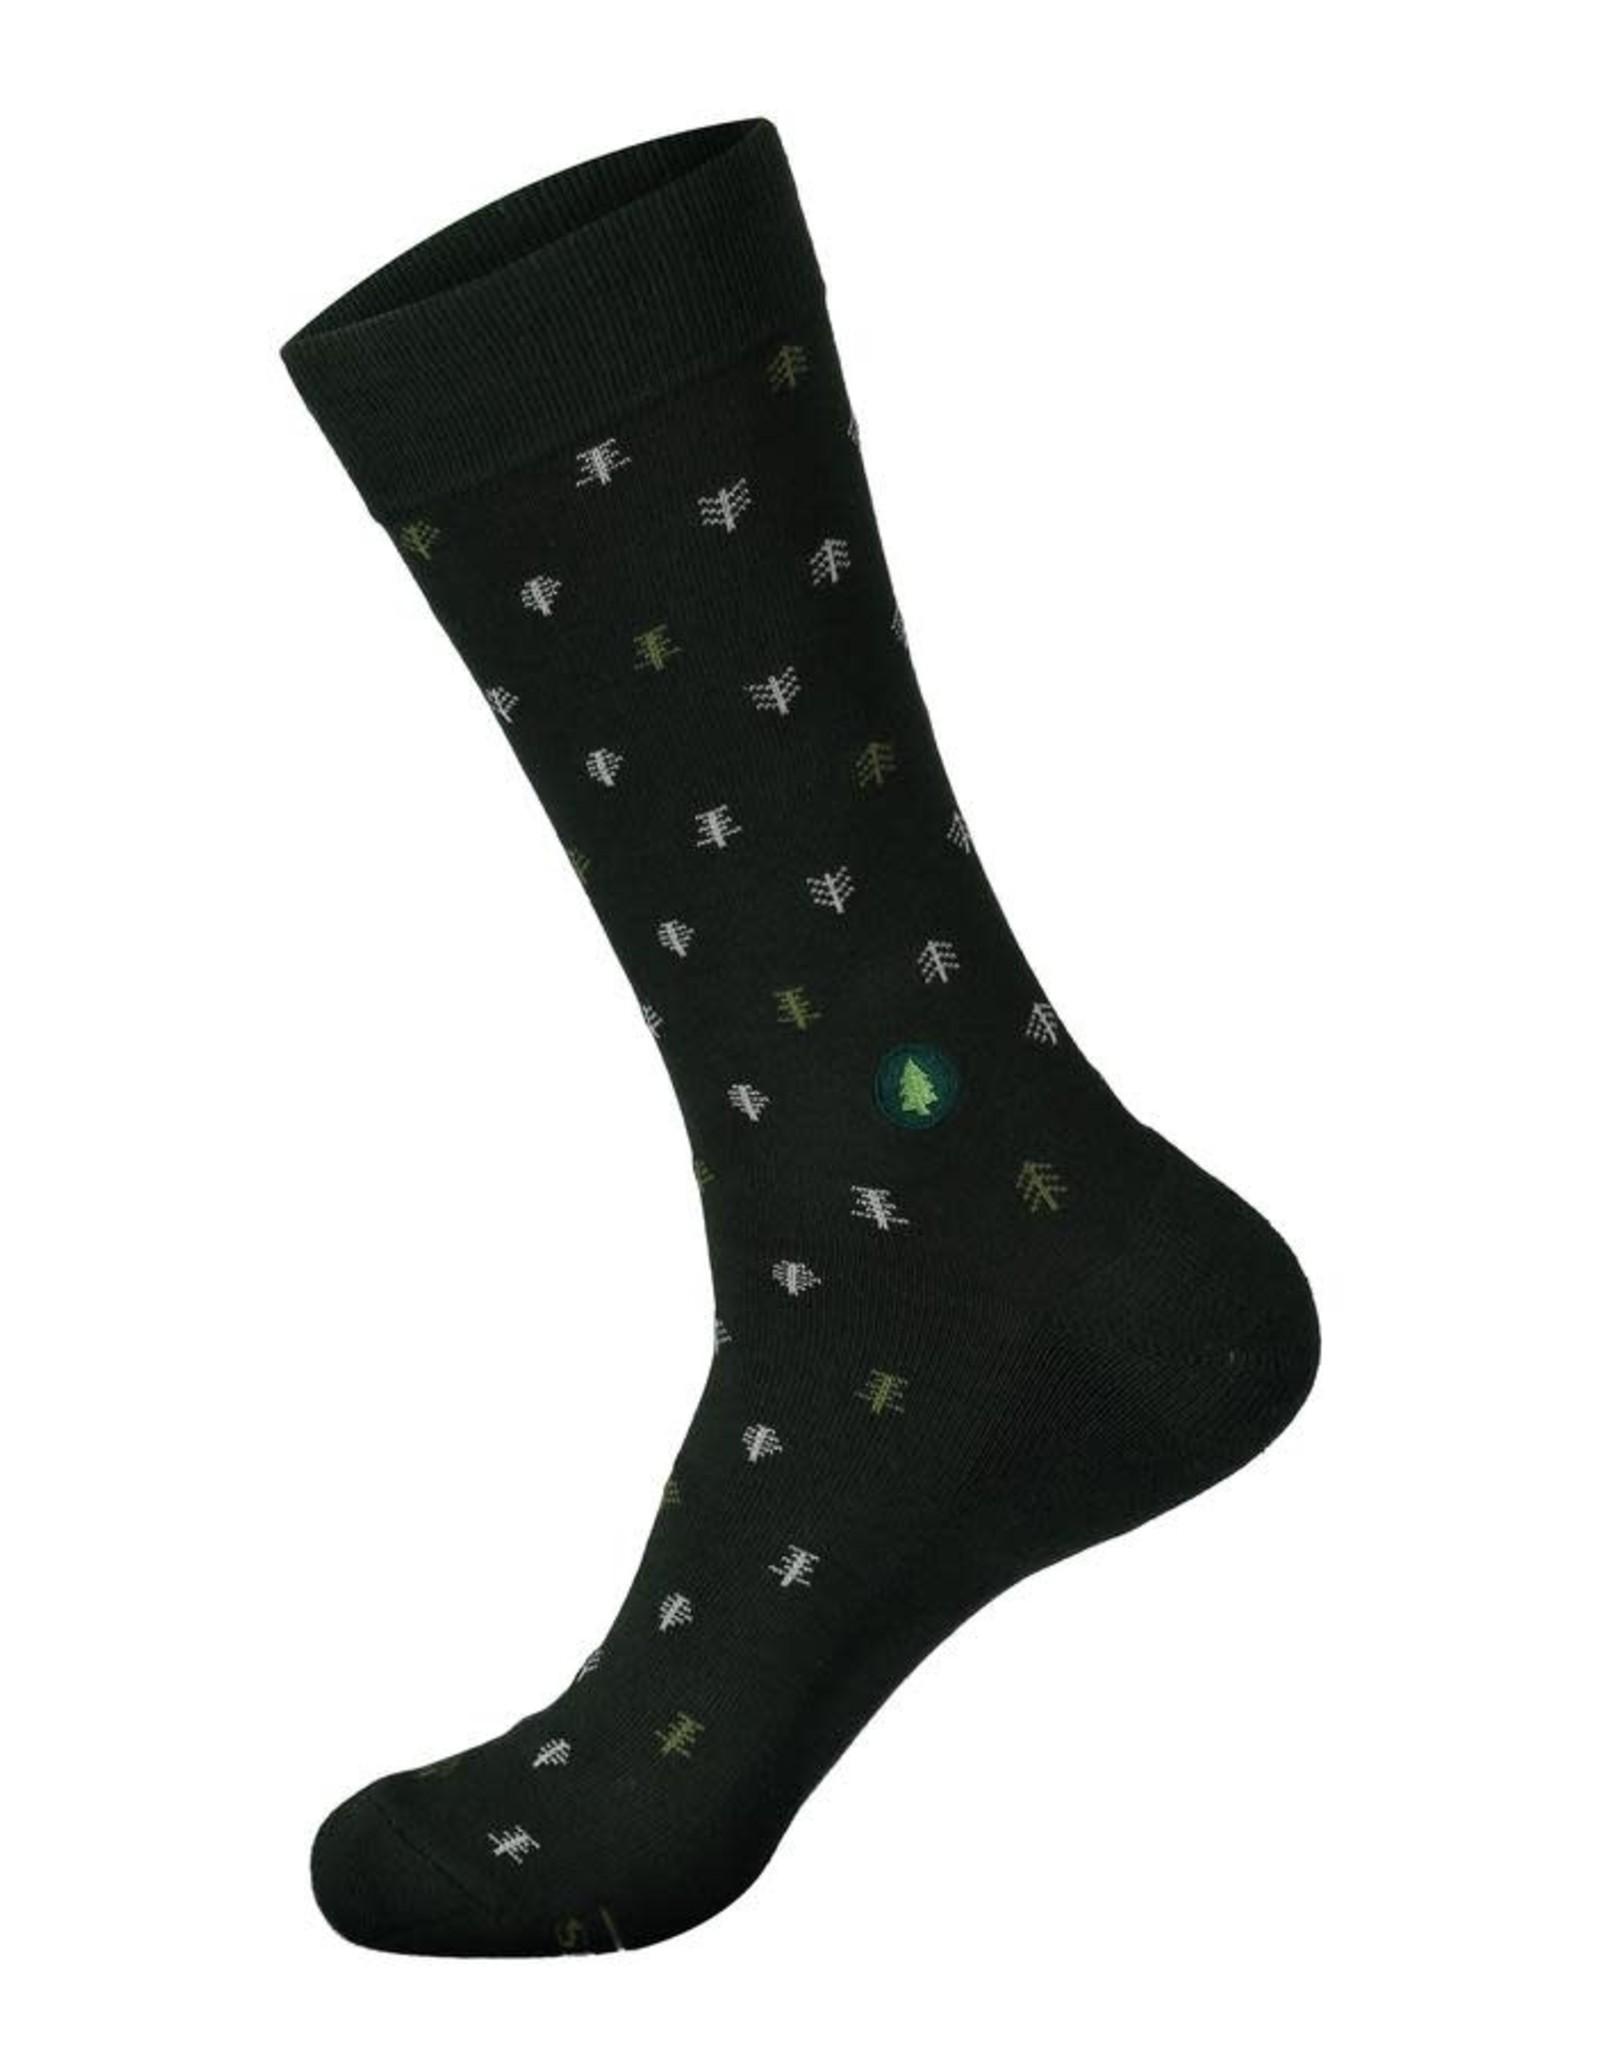 Conscious Step Socks that Plant Trees (Medium) - India